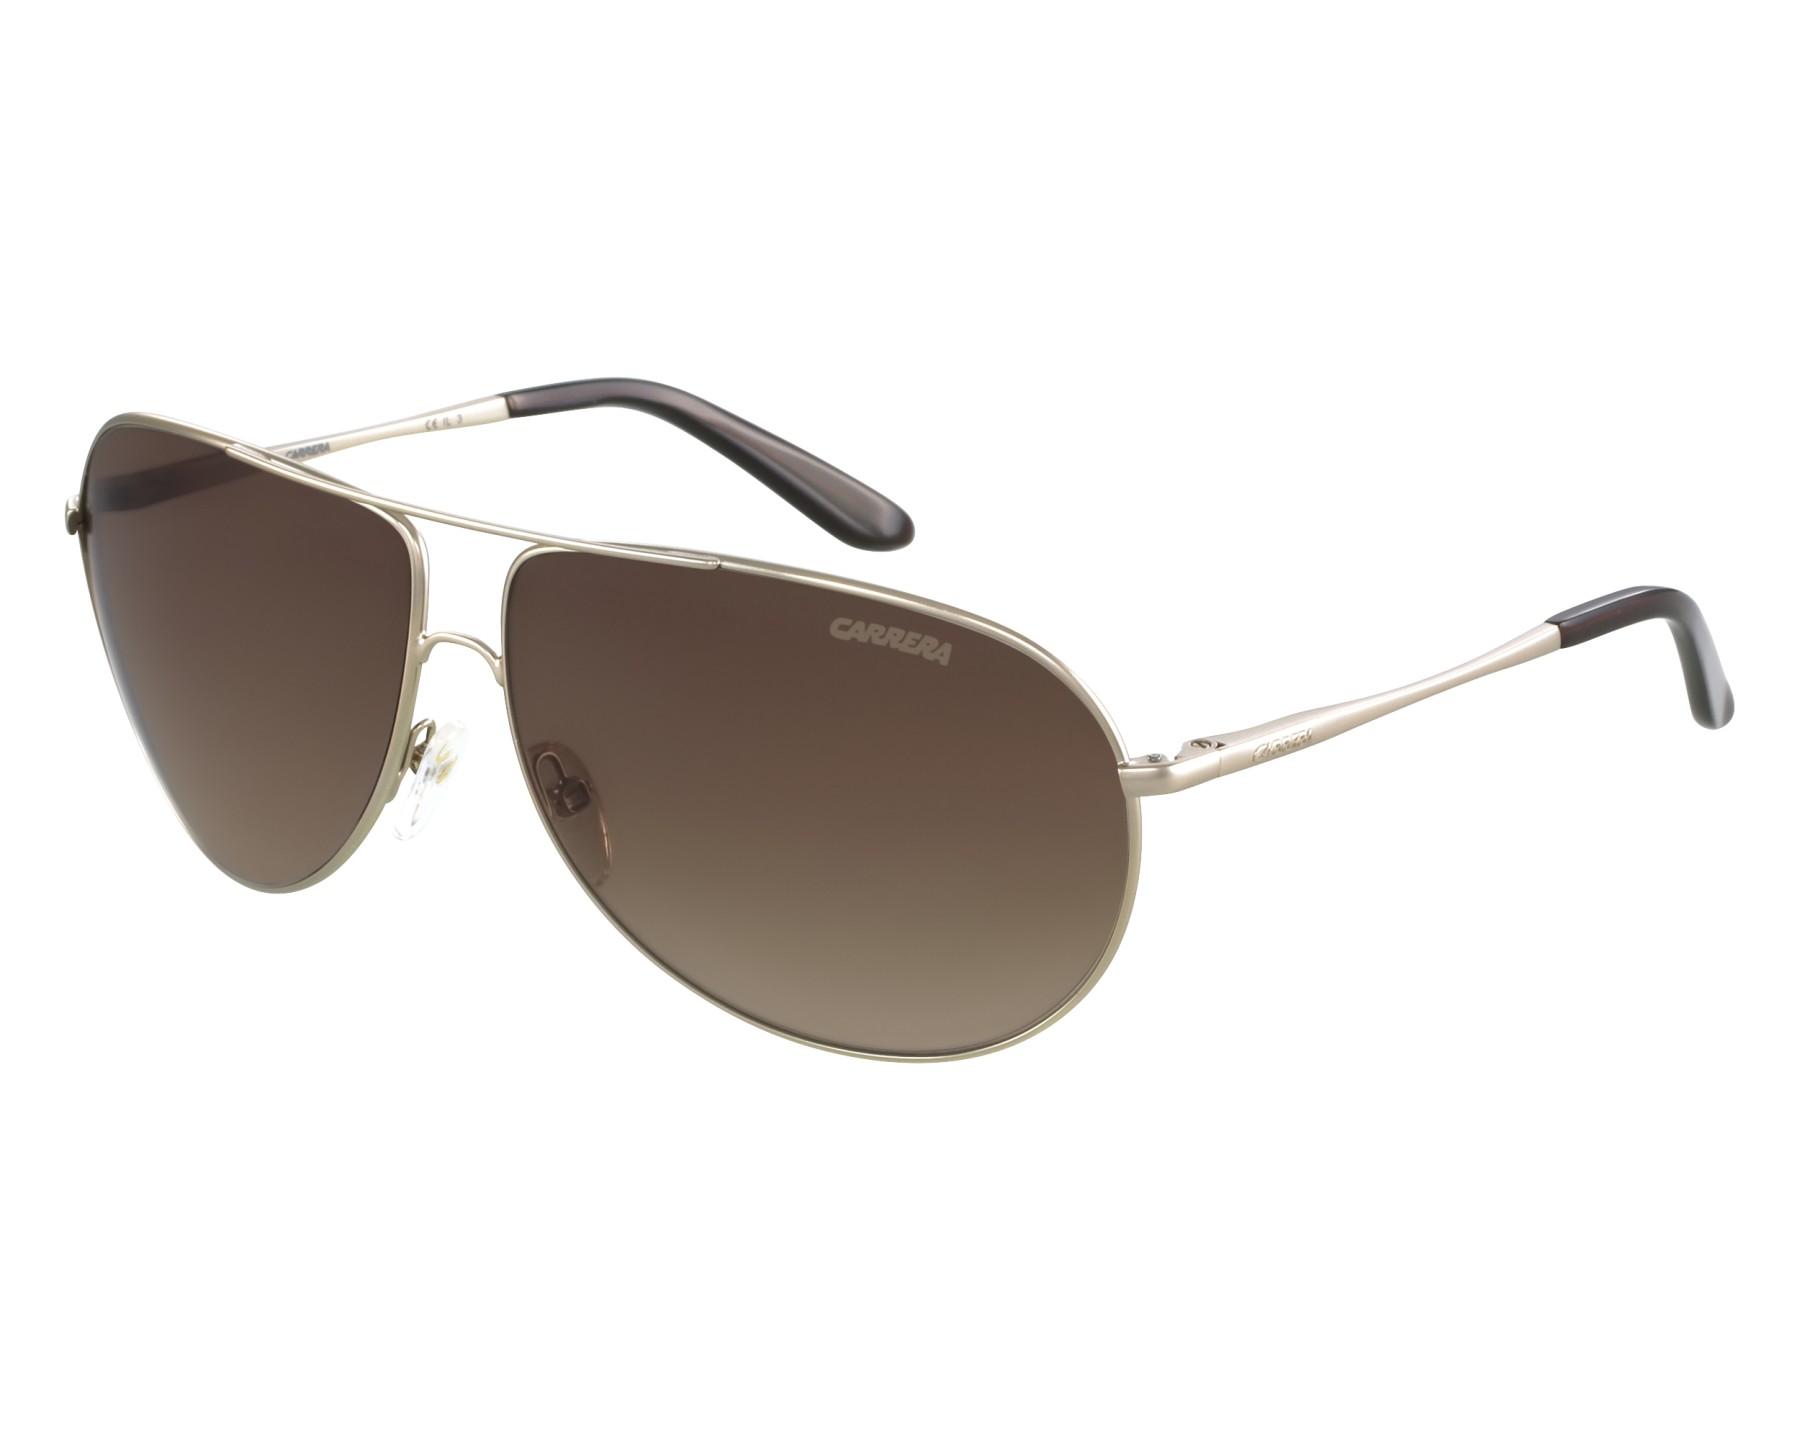 NEW Authentic Carrera SunGlasses frames New Gipsy AOZJ6 | eBay